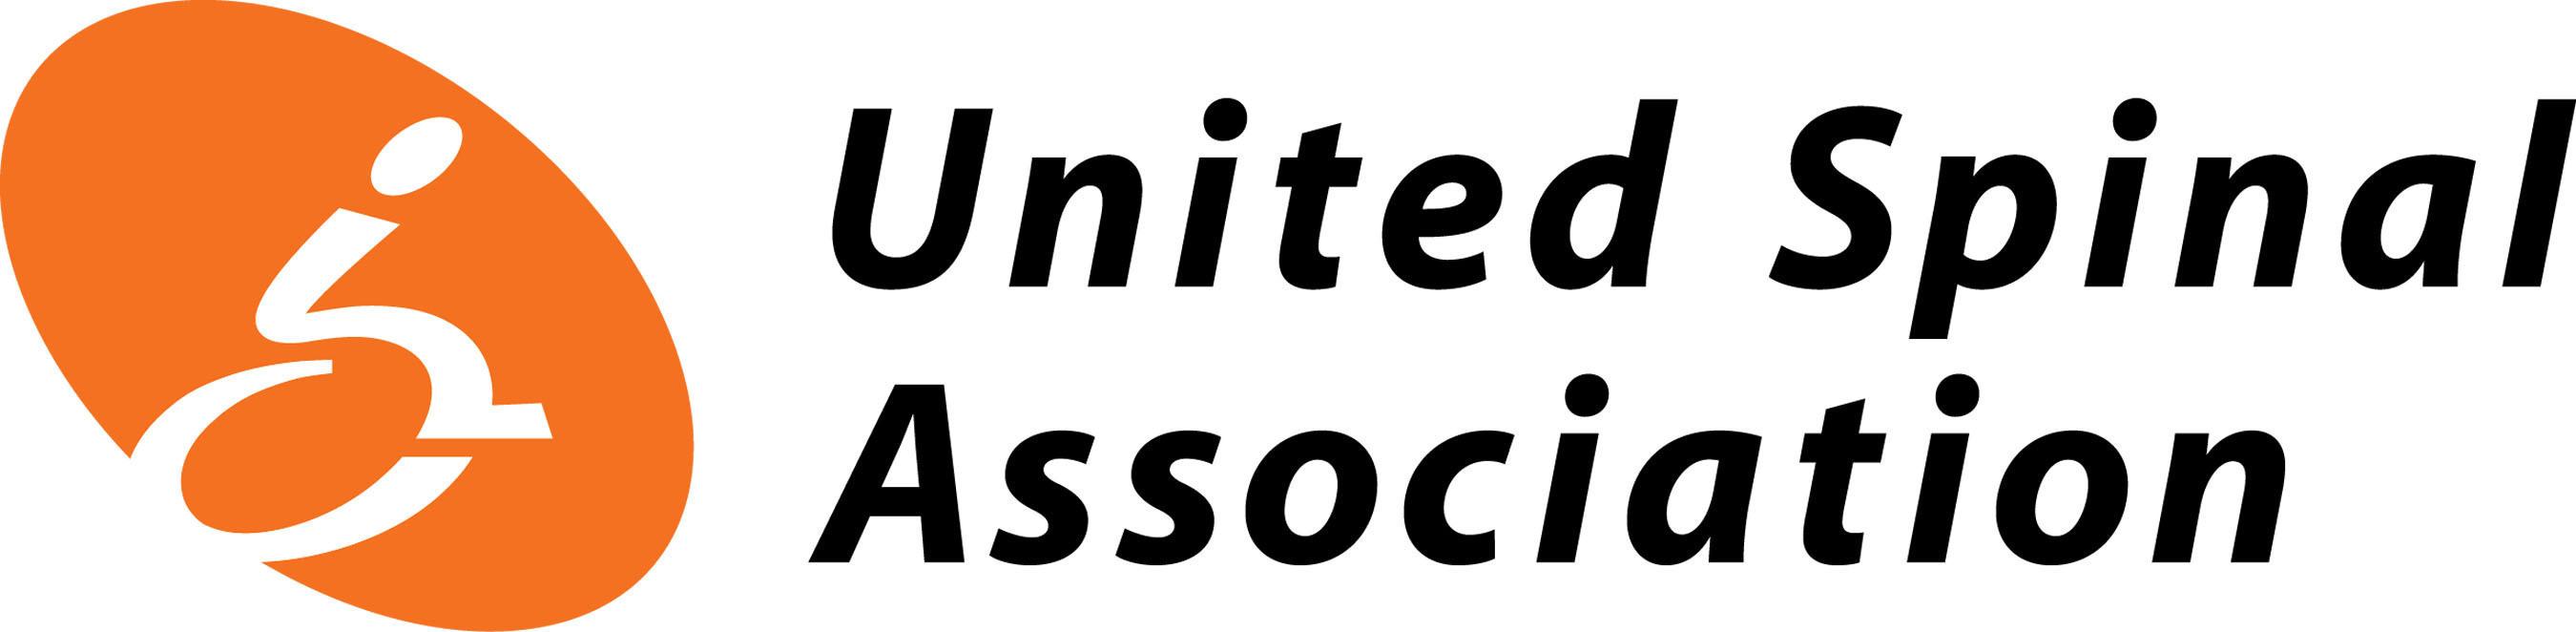 United Spinal Association.